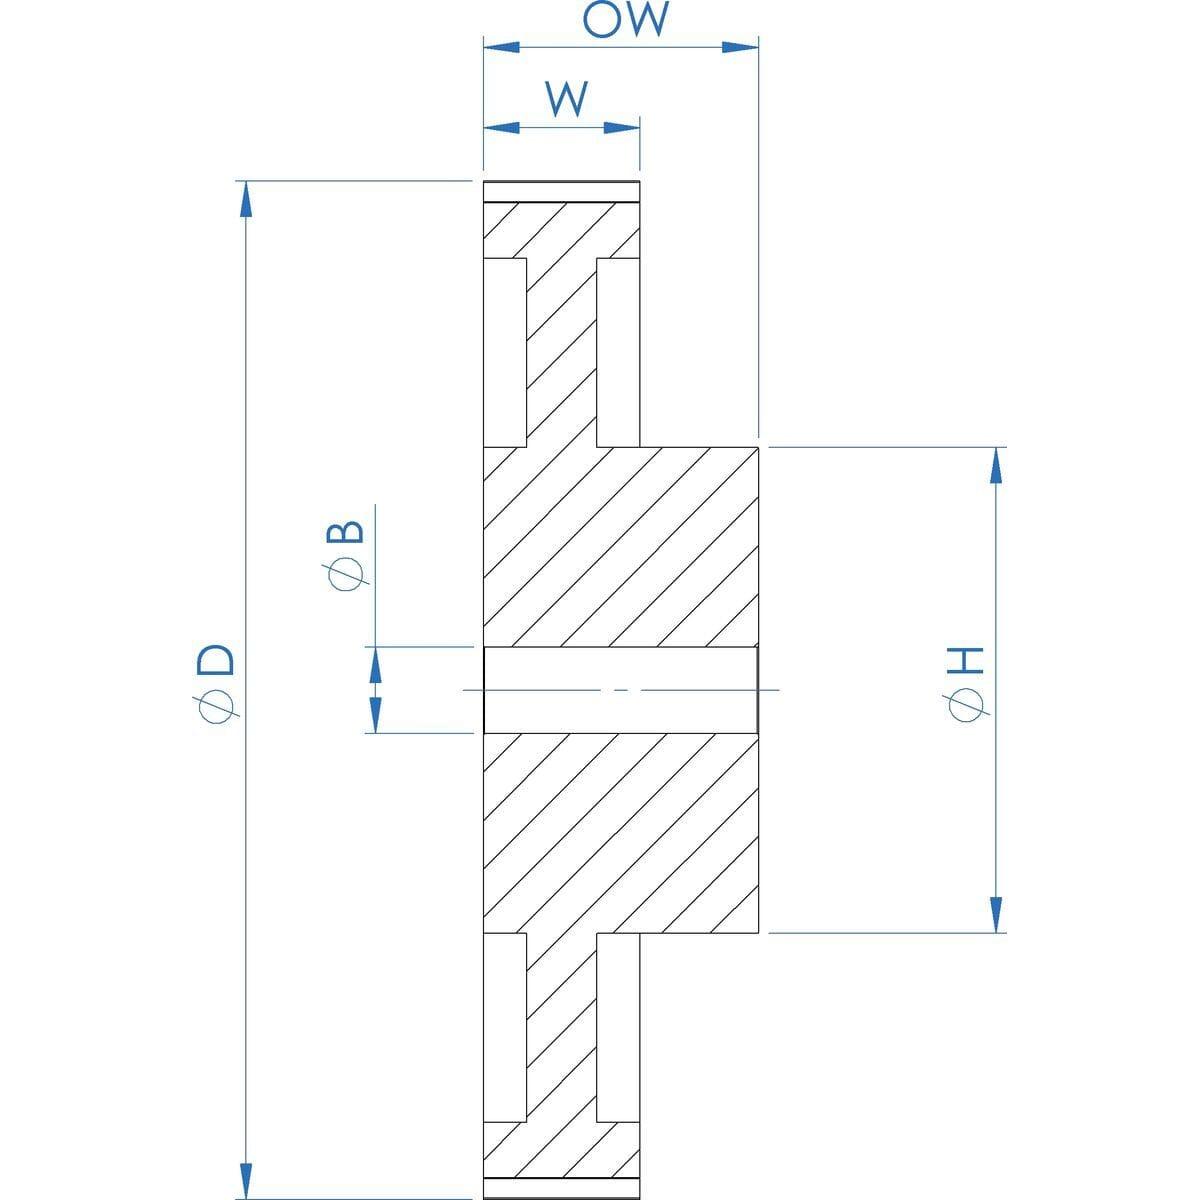 60 Teeth x 9.53mm Belt Width, XL Type Precision Timing Pulleys - P60XL037 Drawing